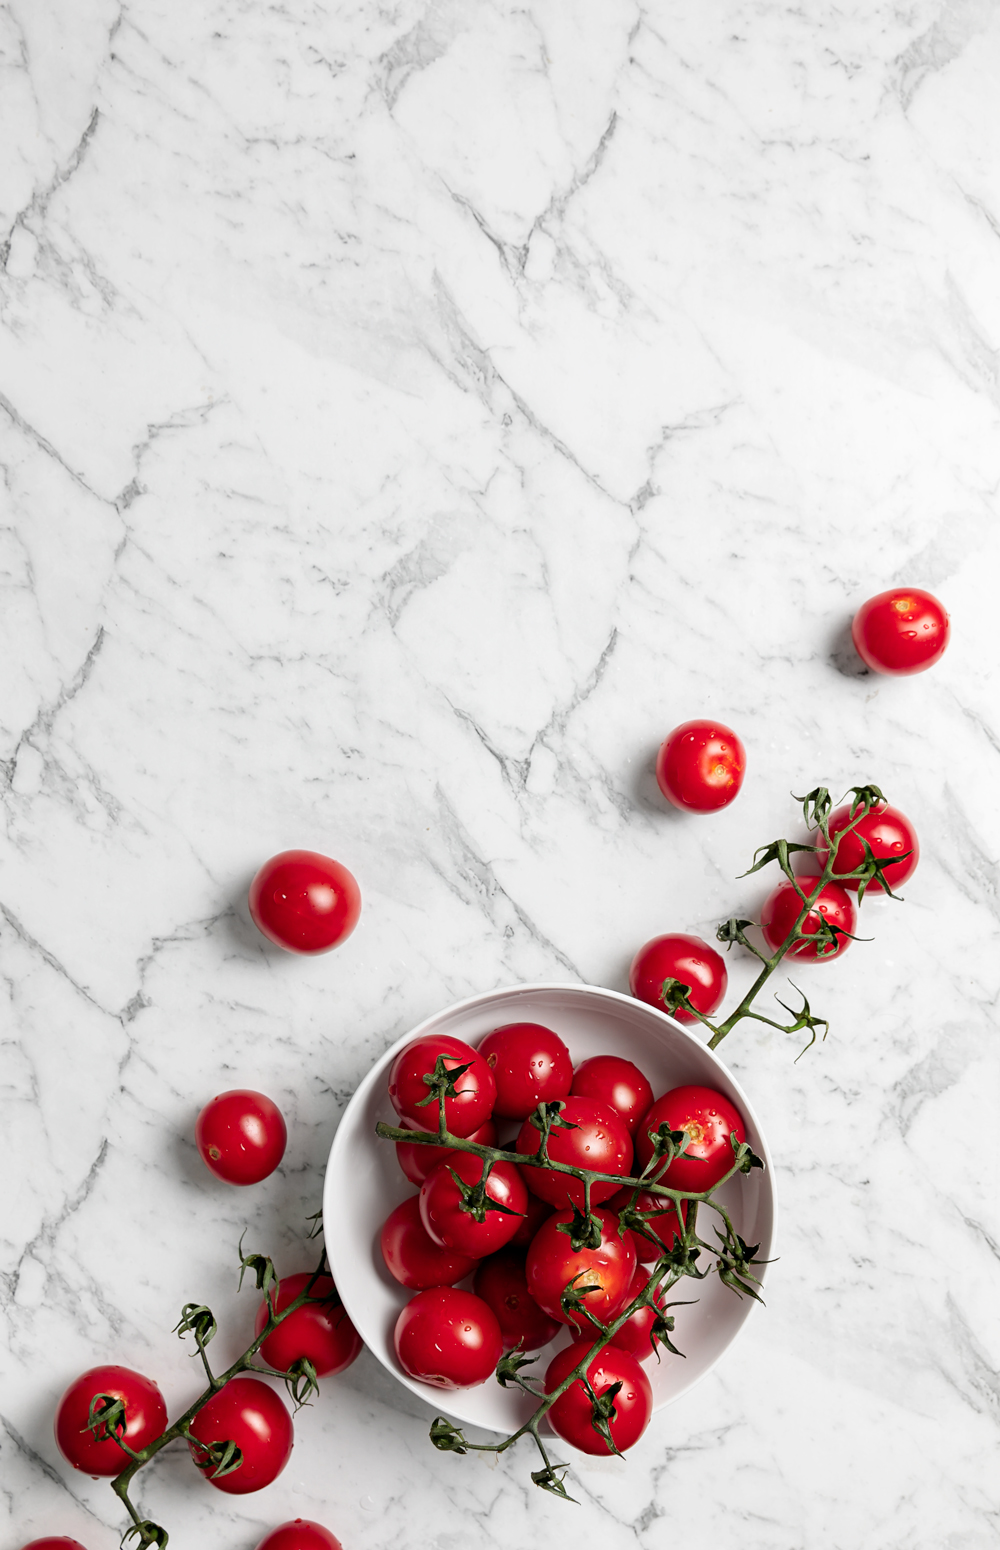 bowl of cherry tomatoes   www.curatedlifestudio.com